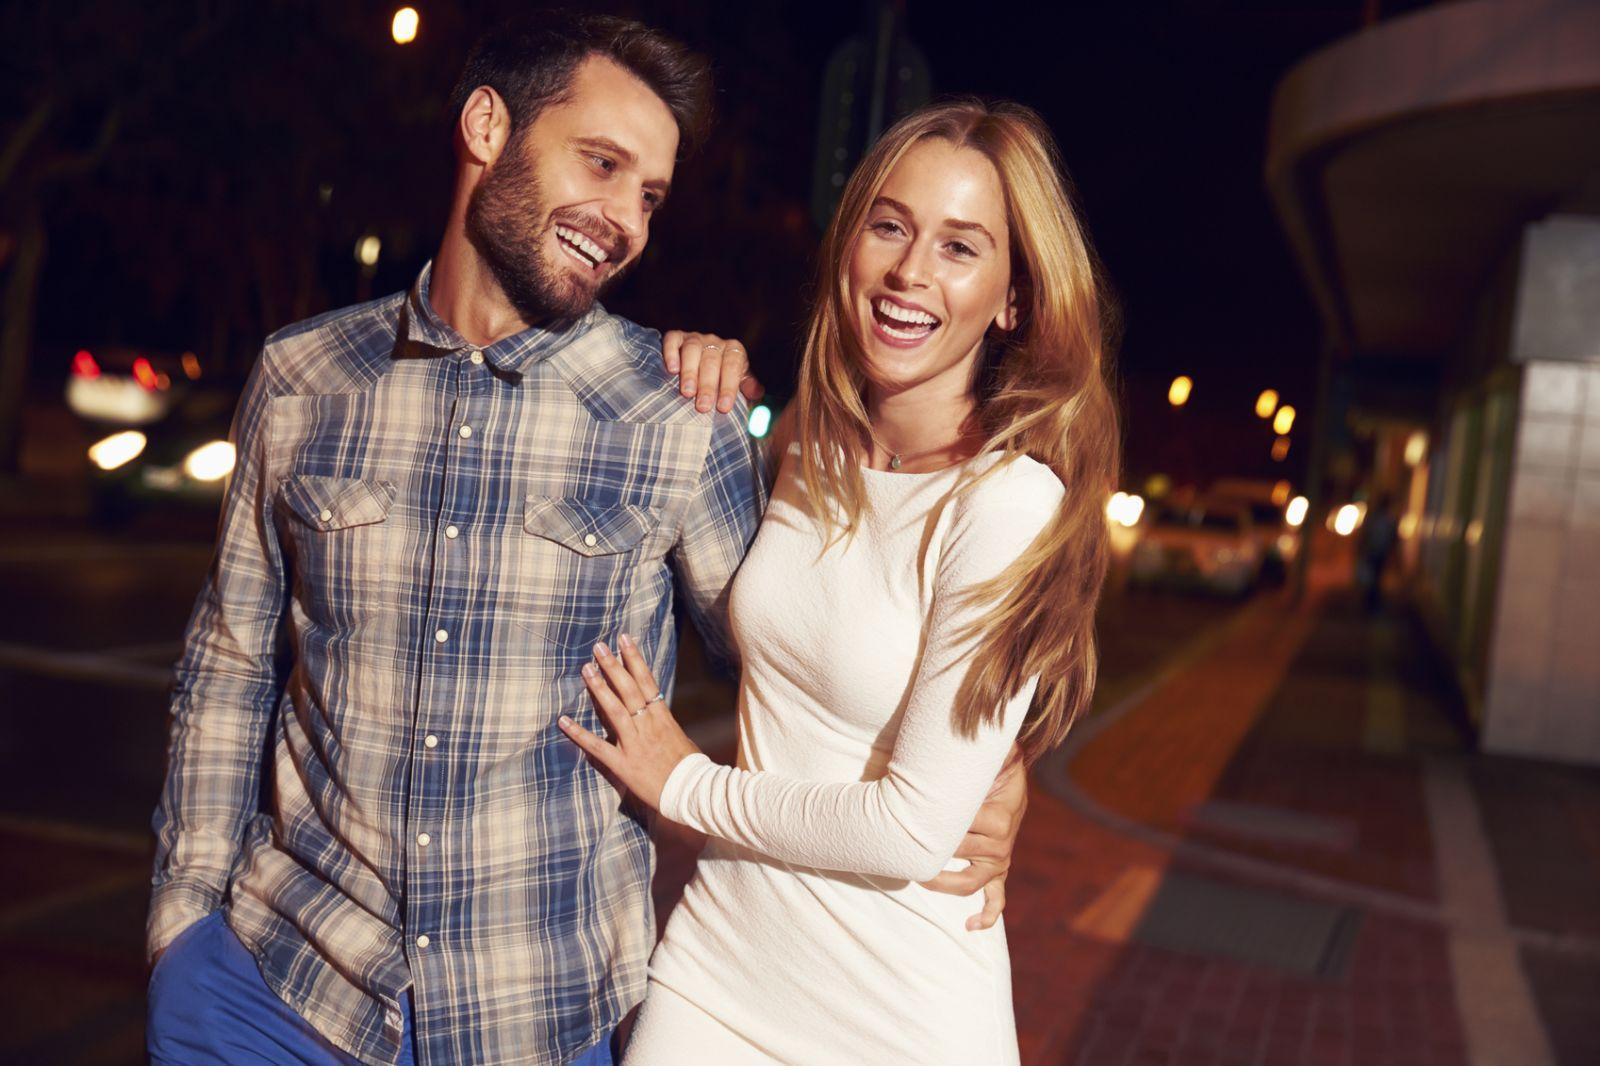 International speed dating Boedapest